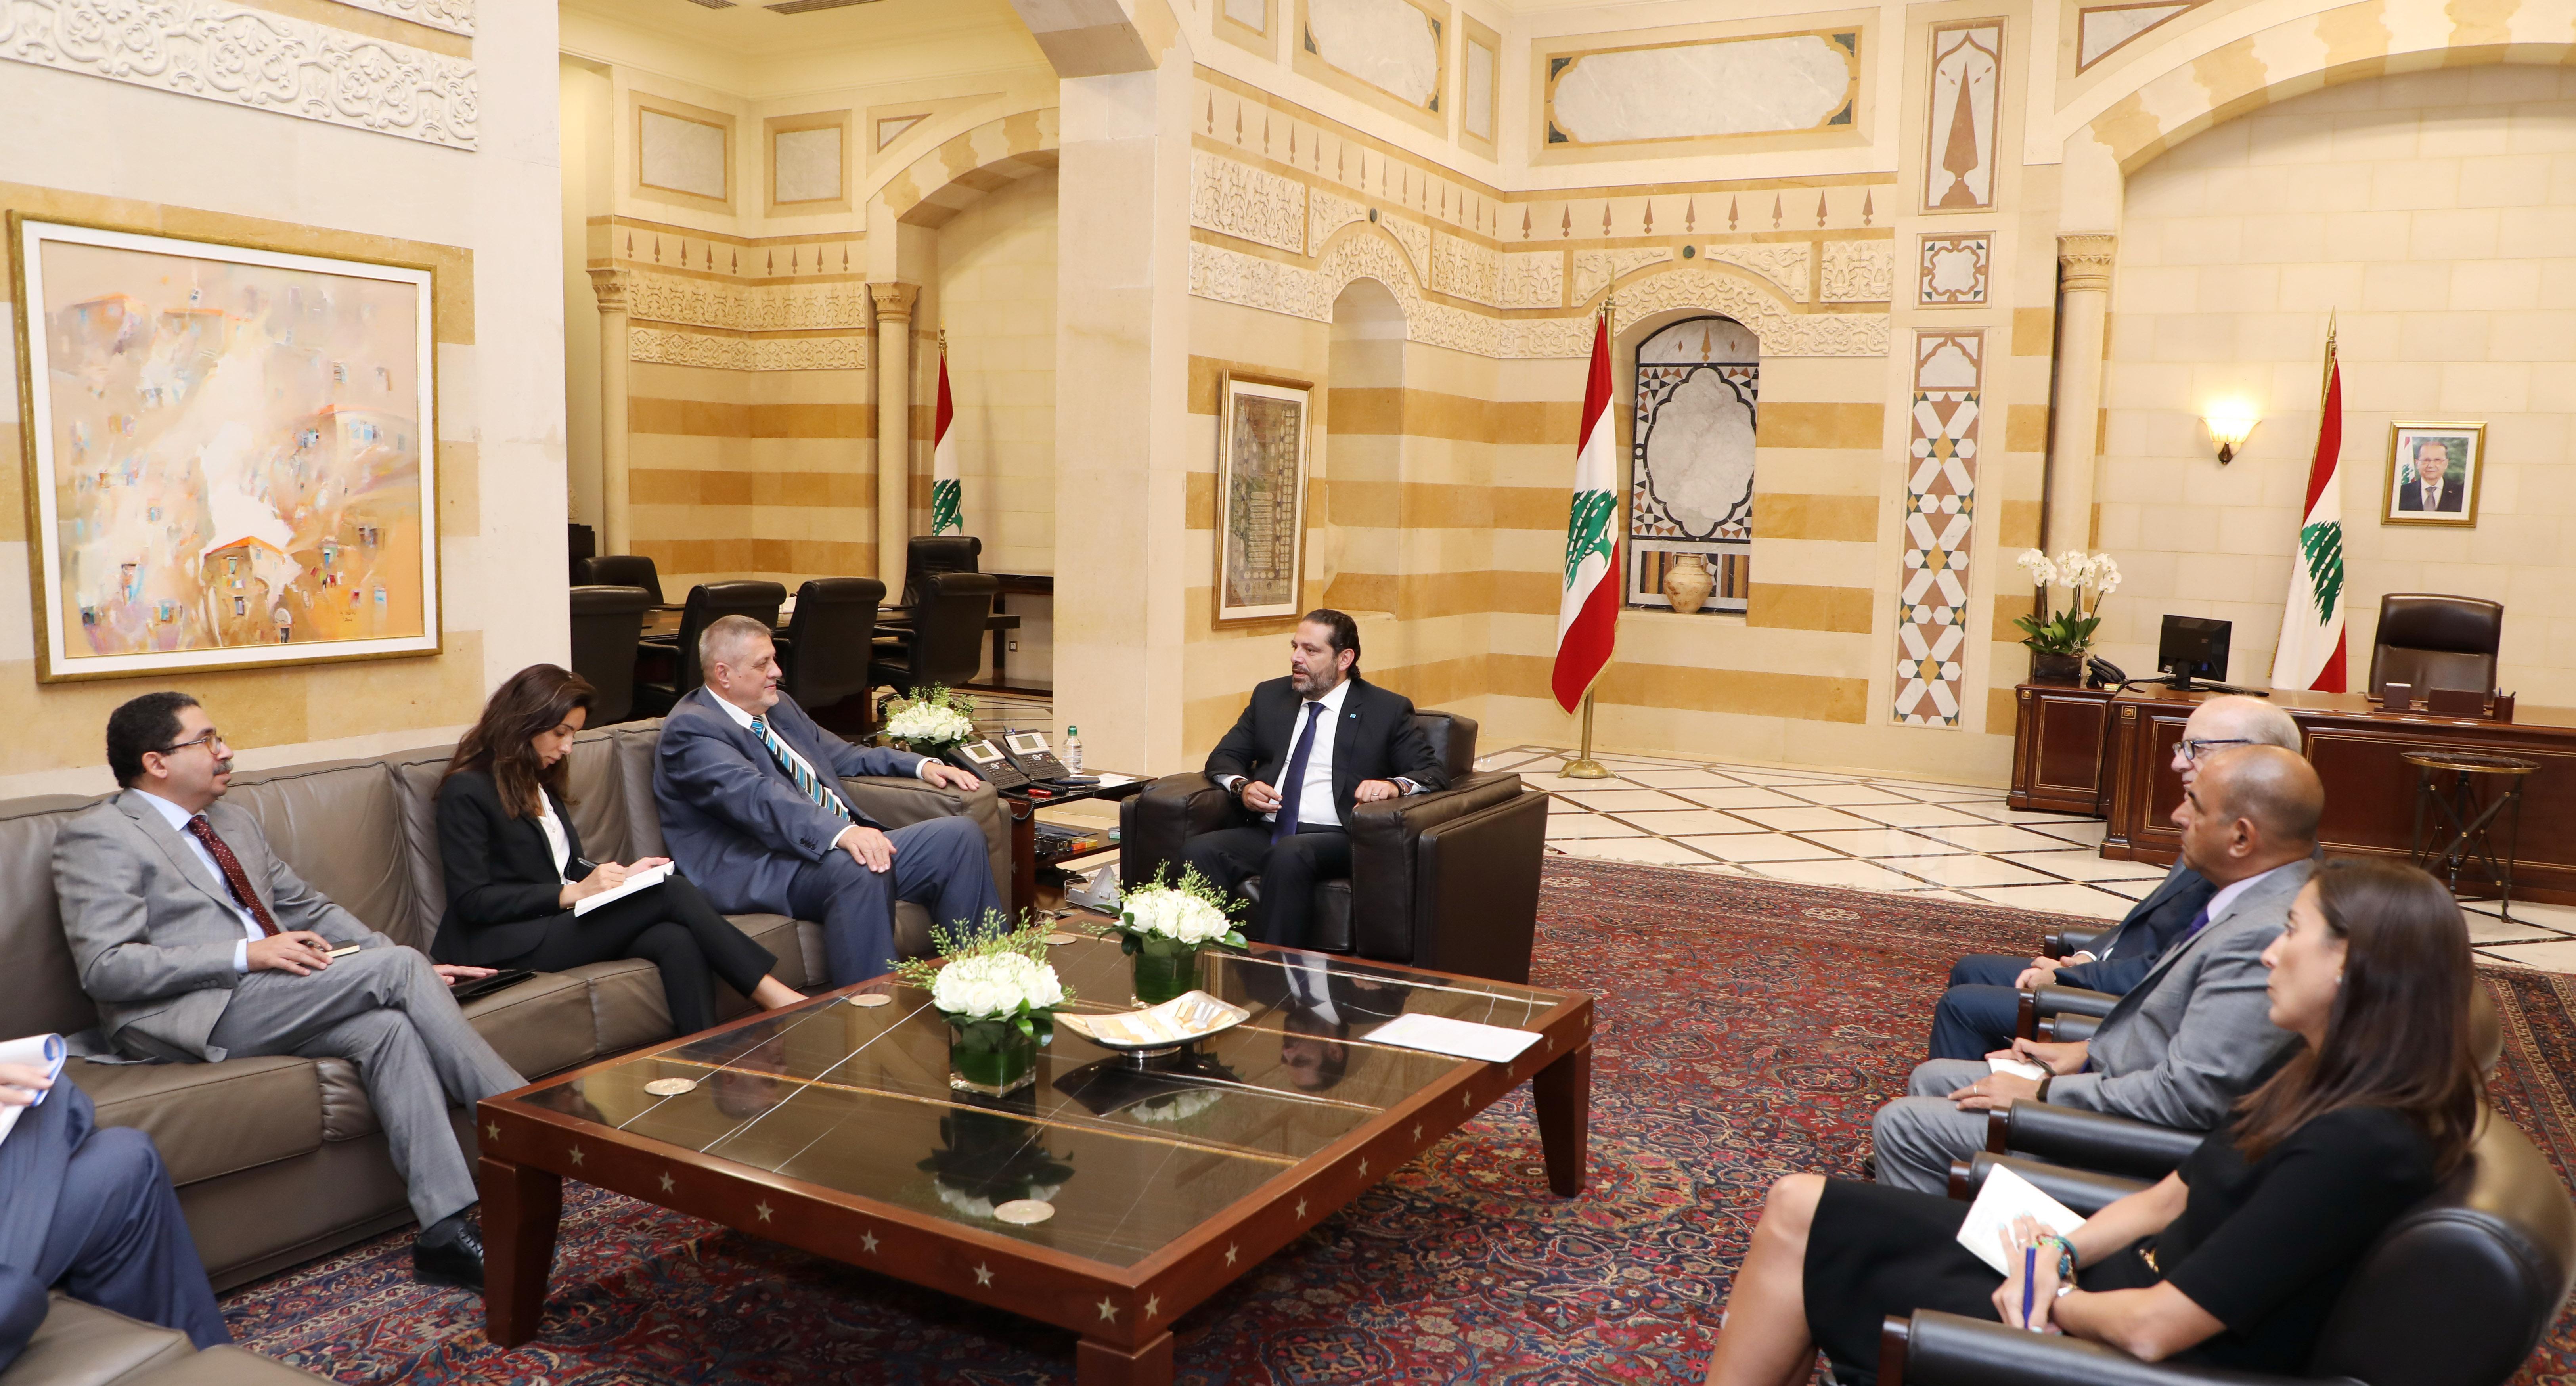 Pr Minister Saad Hariri meets Mr Jean Kubiss 2